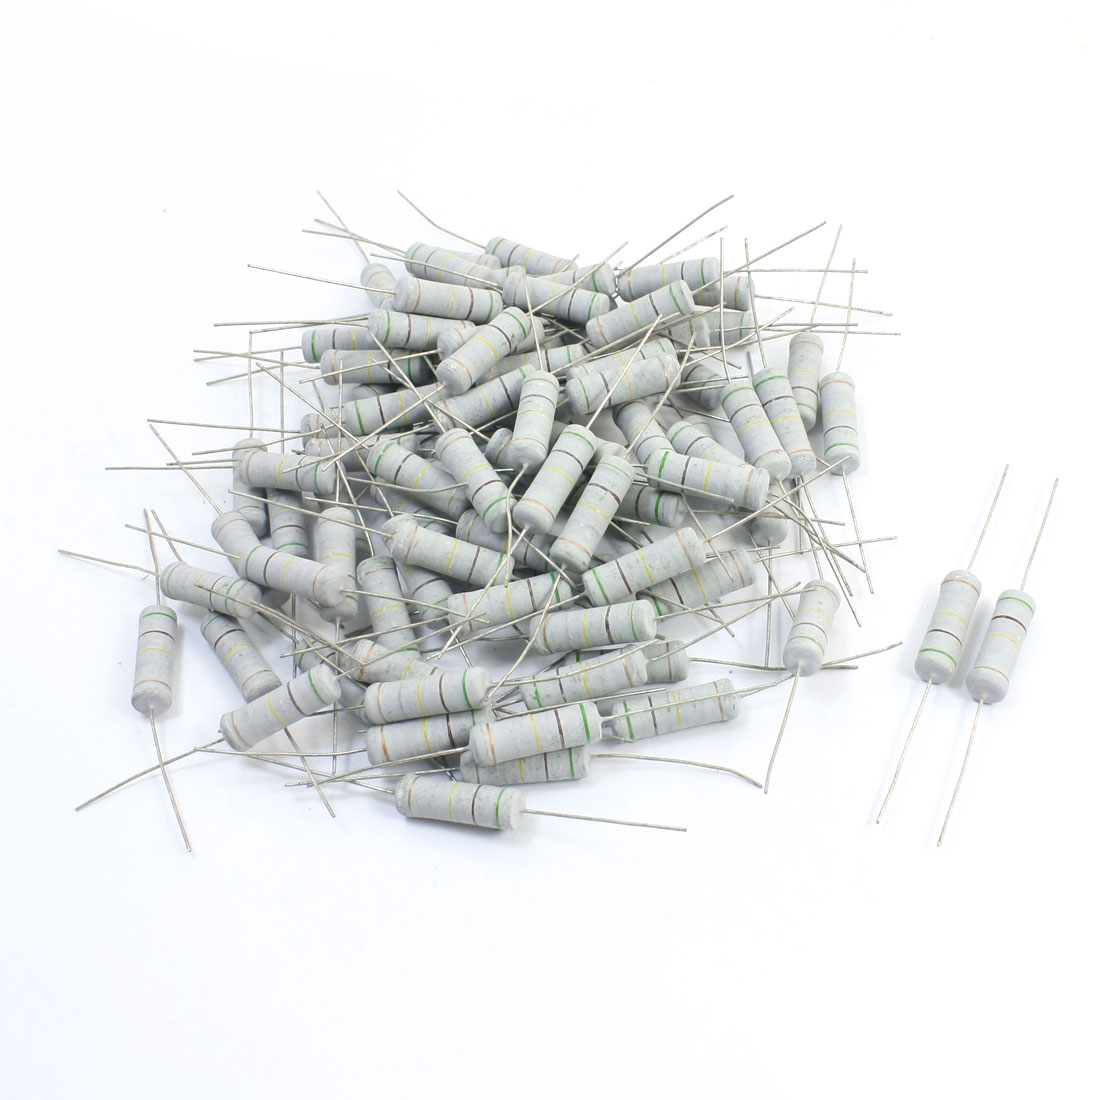 100Pcs 510K Ohm 5W 5% Axial Leads Metal Oxide Film Resistor Resistance